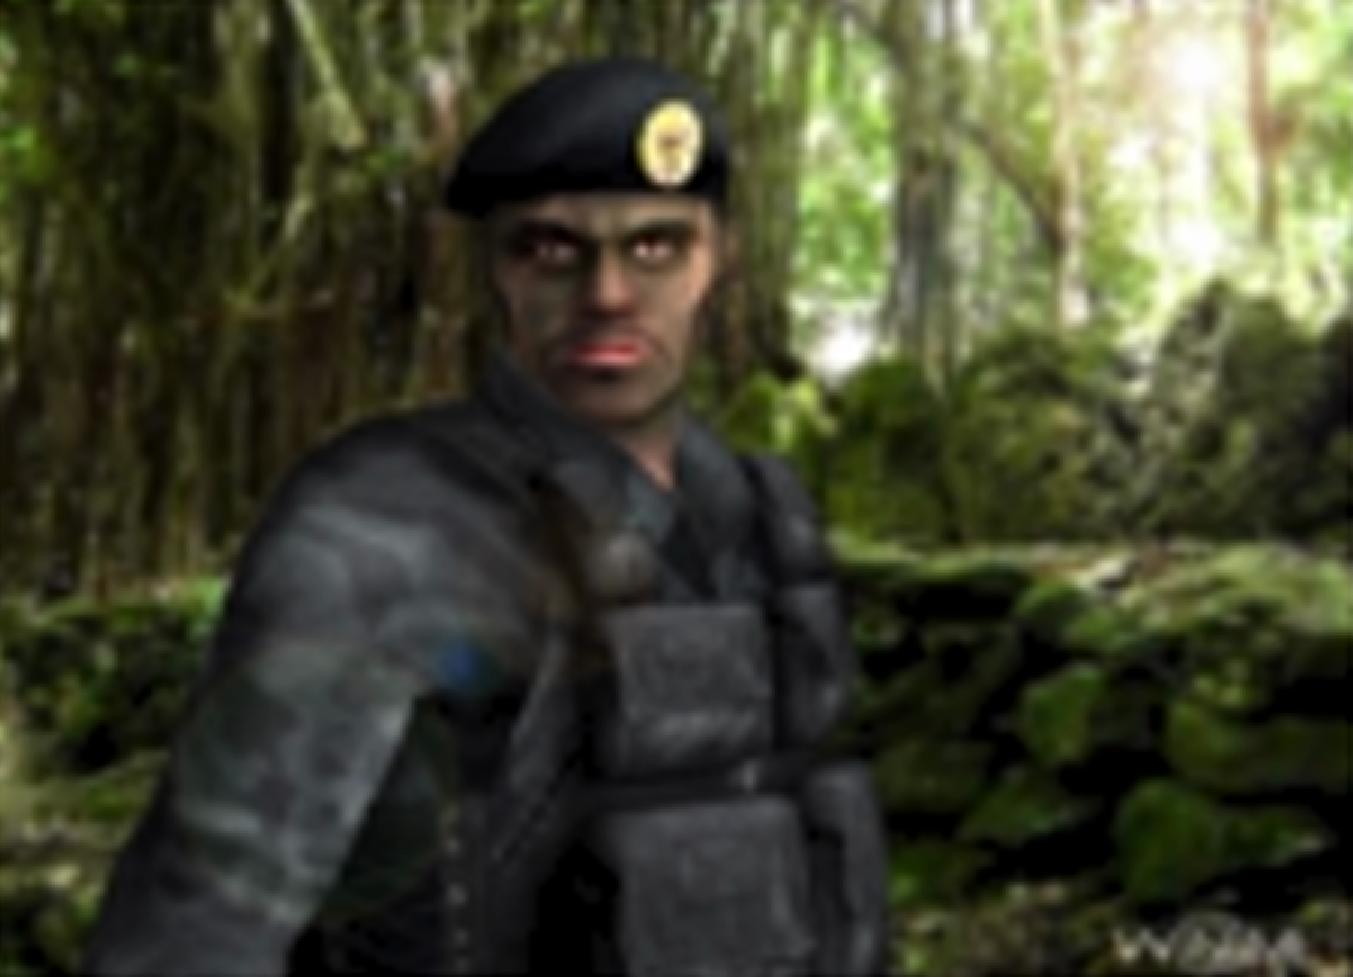 General Ontiveros